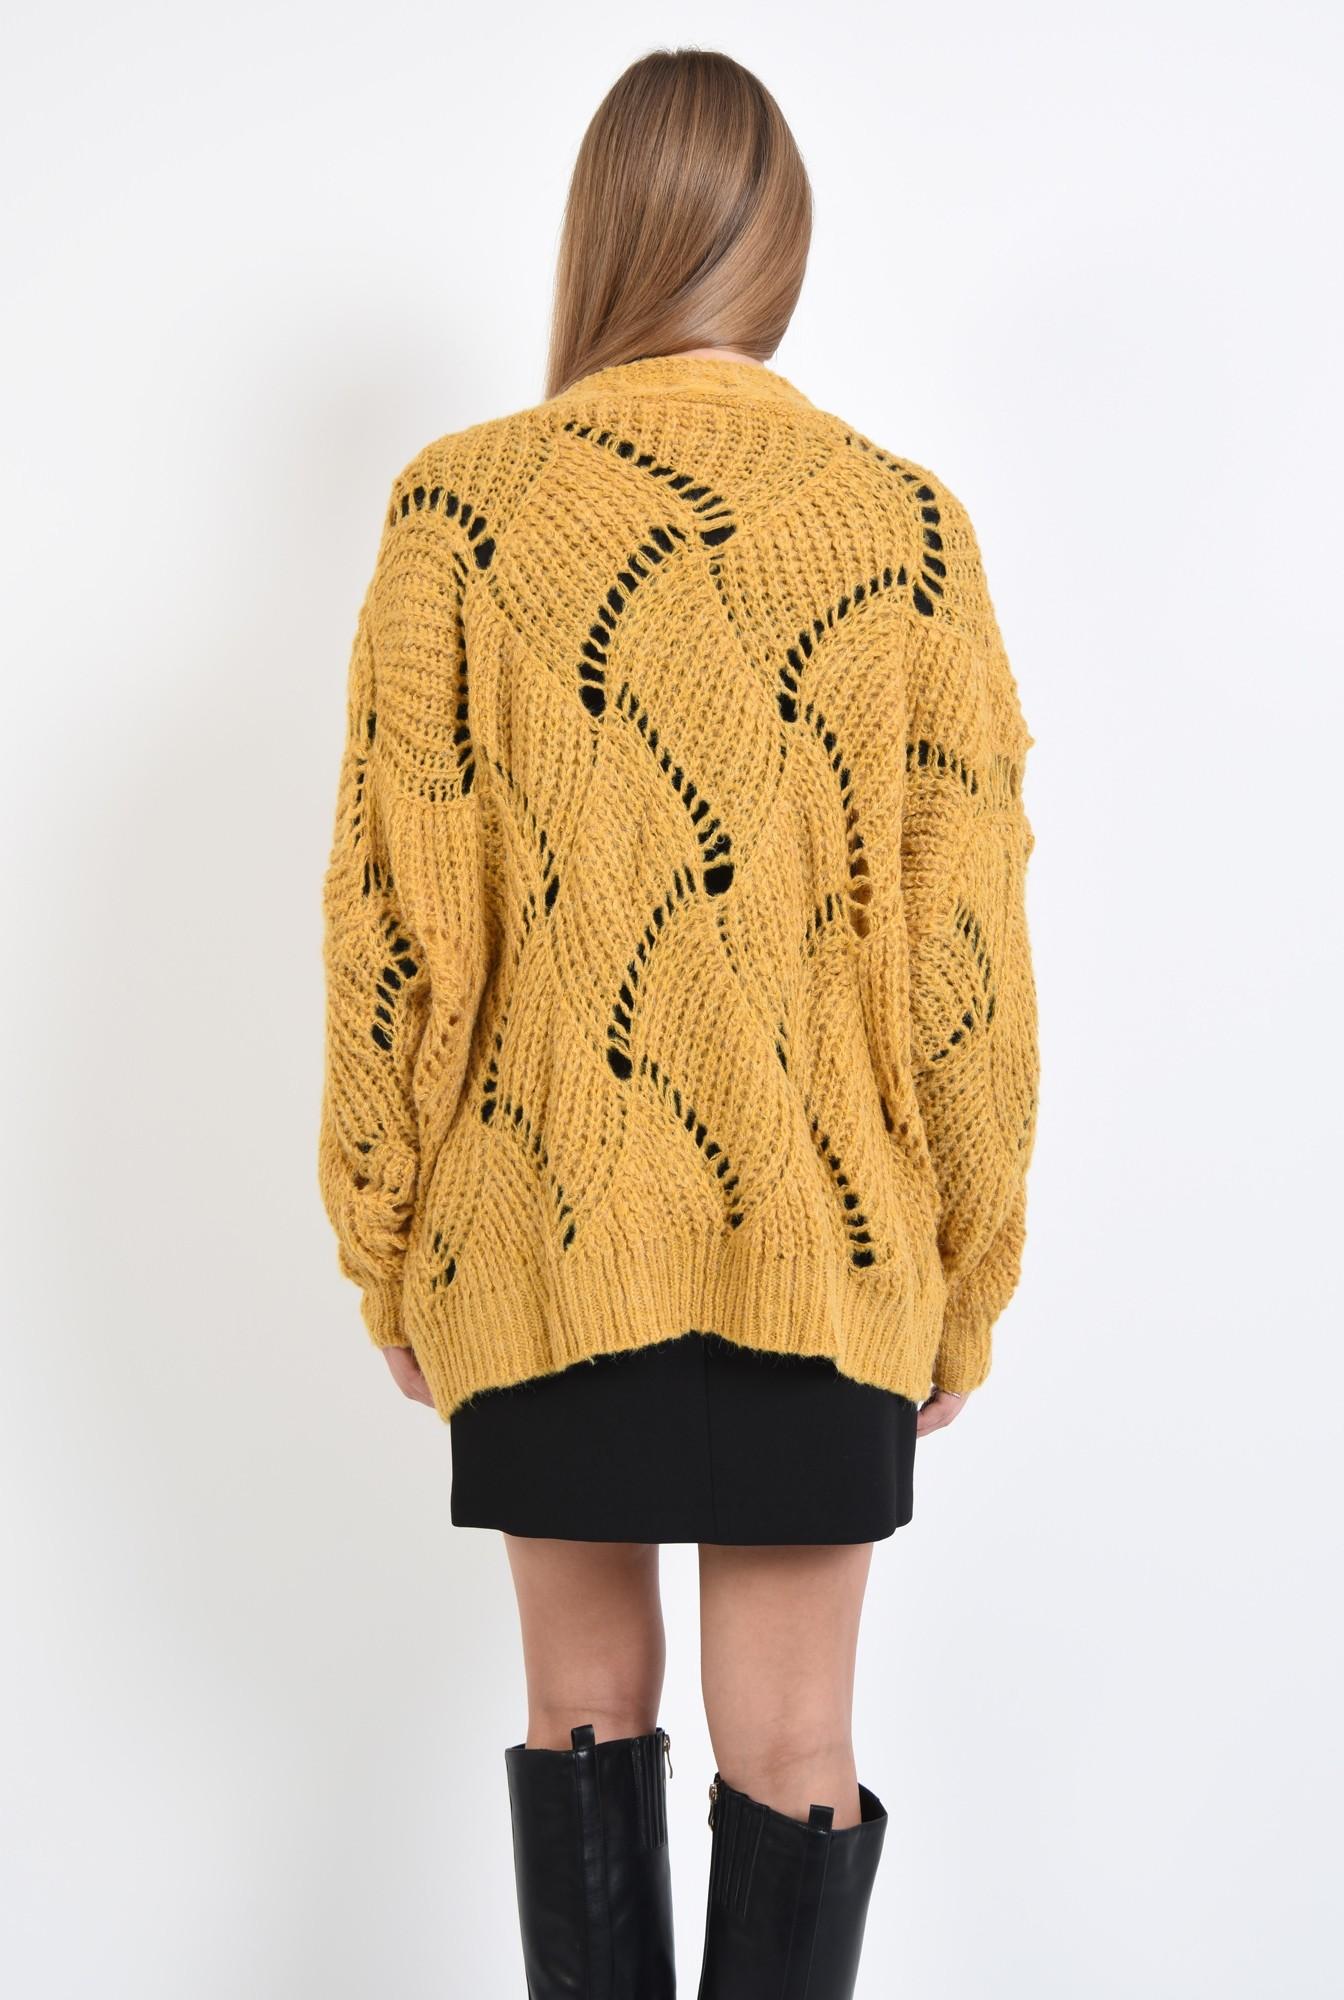 1 - cardigan tricotat, bordura reiata, mansete reiate, mustar, croi relaxat